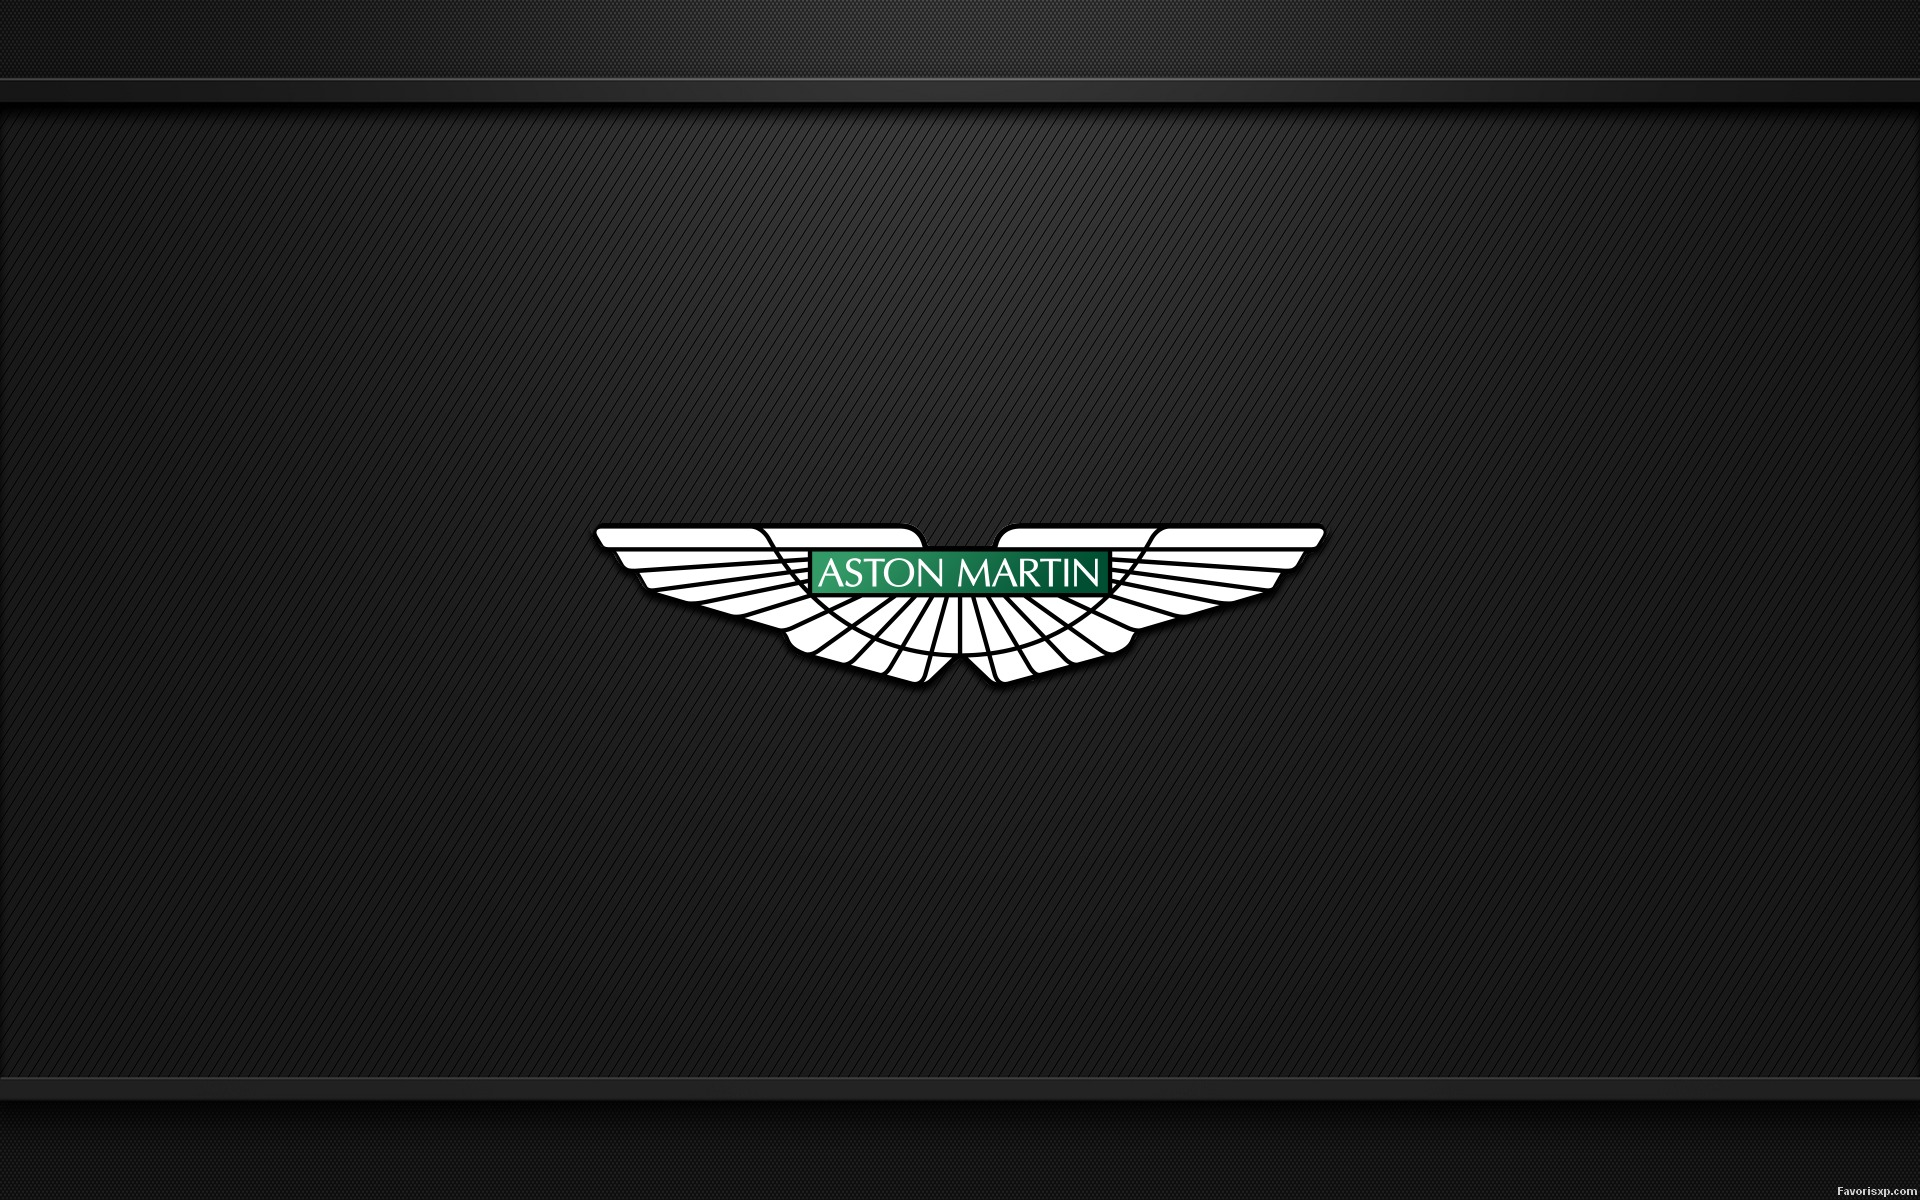 logo marque voiture de prestige jaguar bentley maserati aston martin rolls royce. Black Bedroom Furniture Sets. Home Design Ideas